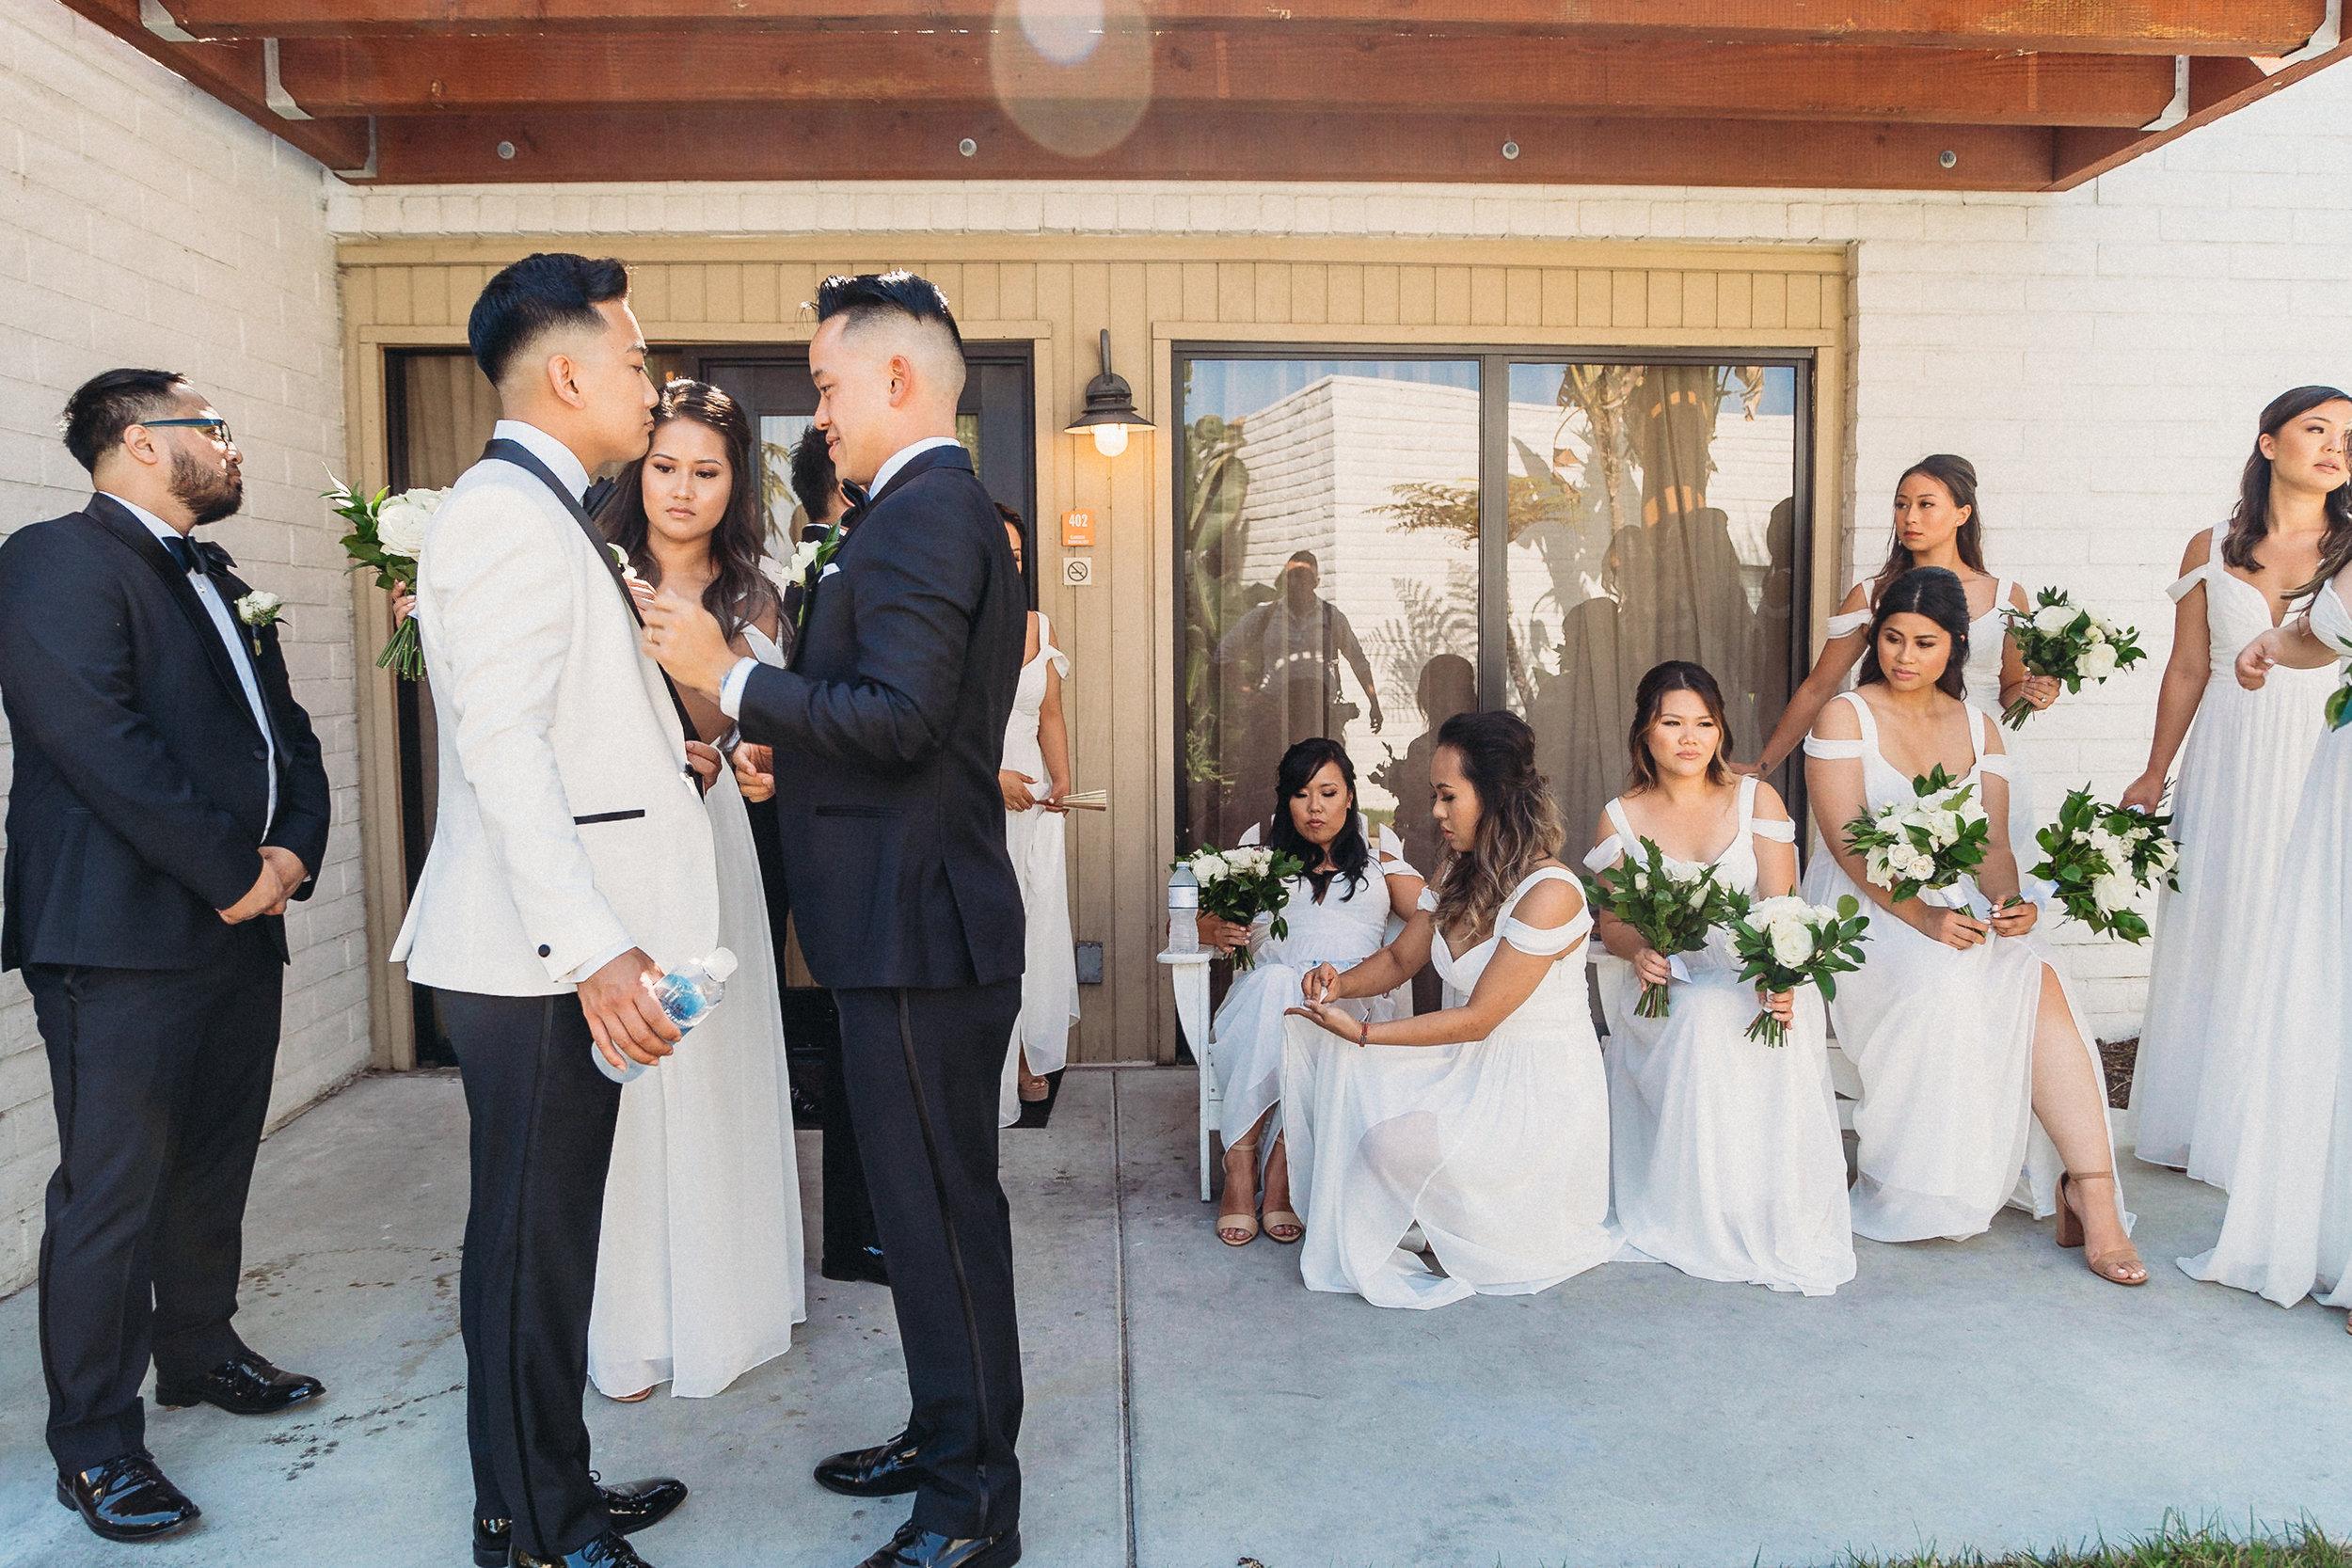 rebeccaylasotras-sandiego-lgbt-wedding-photography-19.jpg